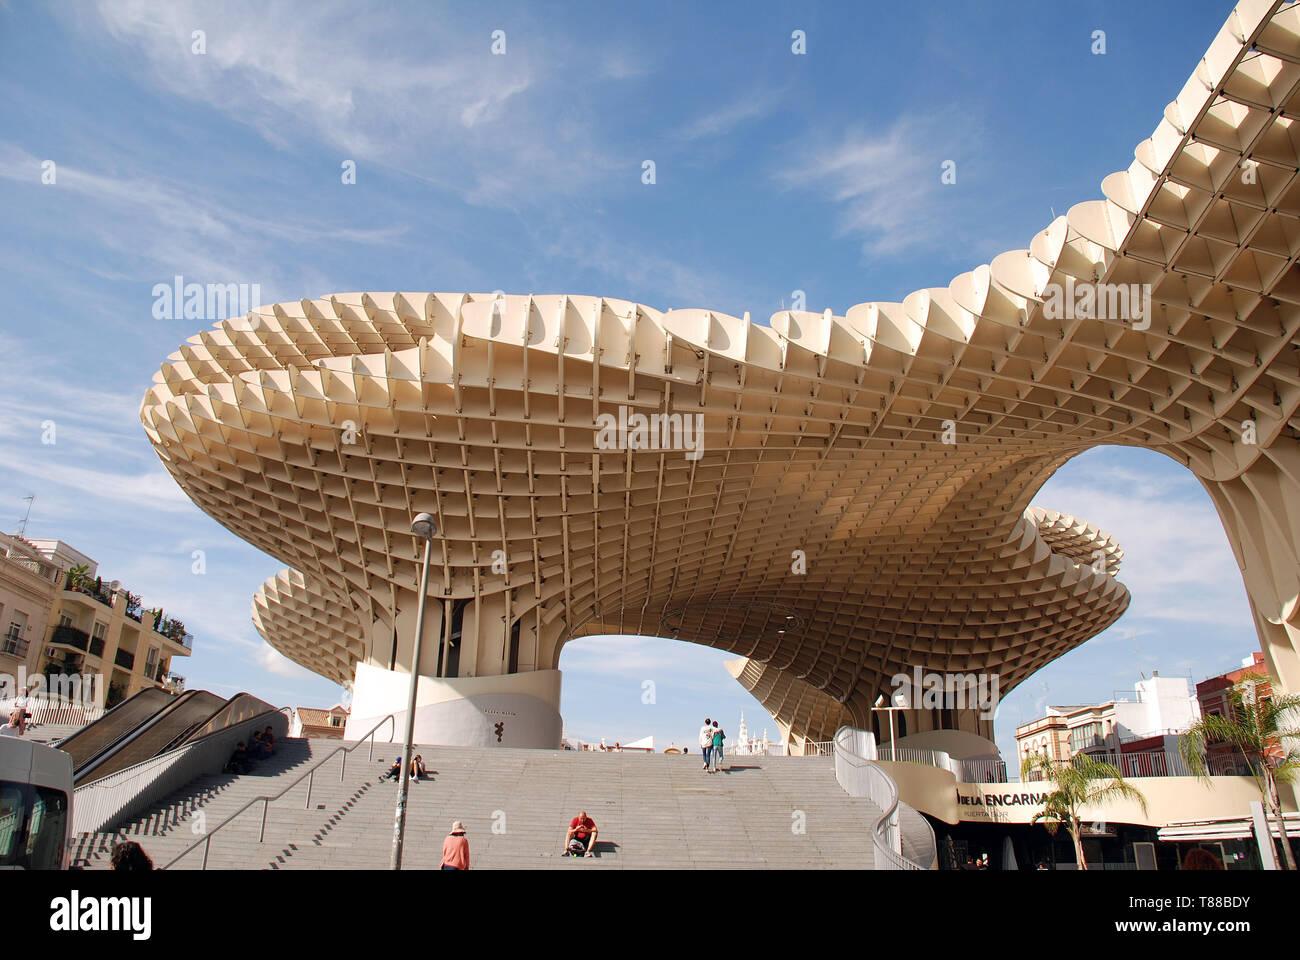 The Metropol Parasol, known as Las Setas de Sevilla (Mushrooms of Seville) at the Plaza de la Encarnacion in Seville, Spain on April 2, 2019. Stock Photo